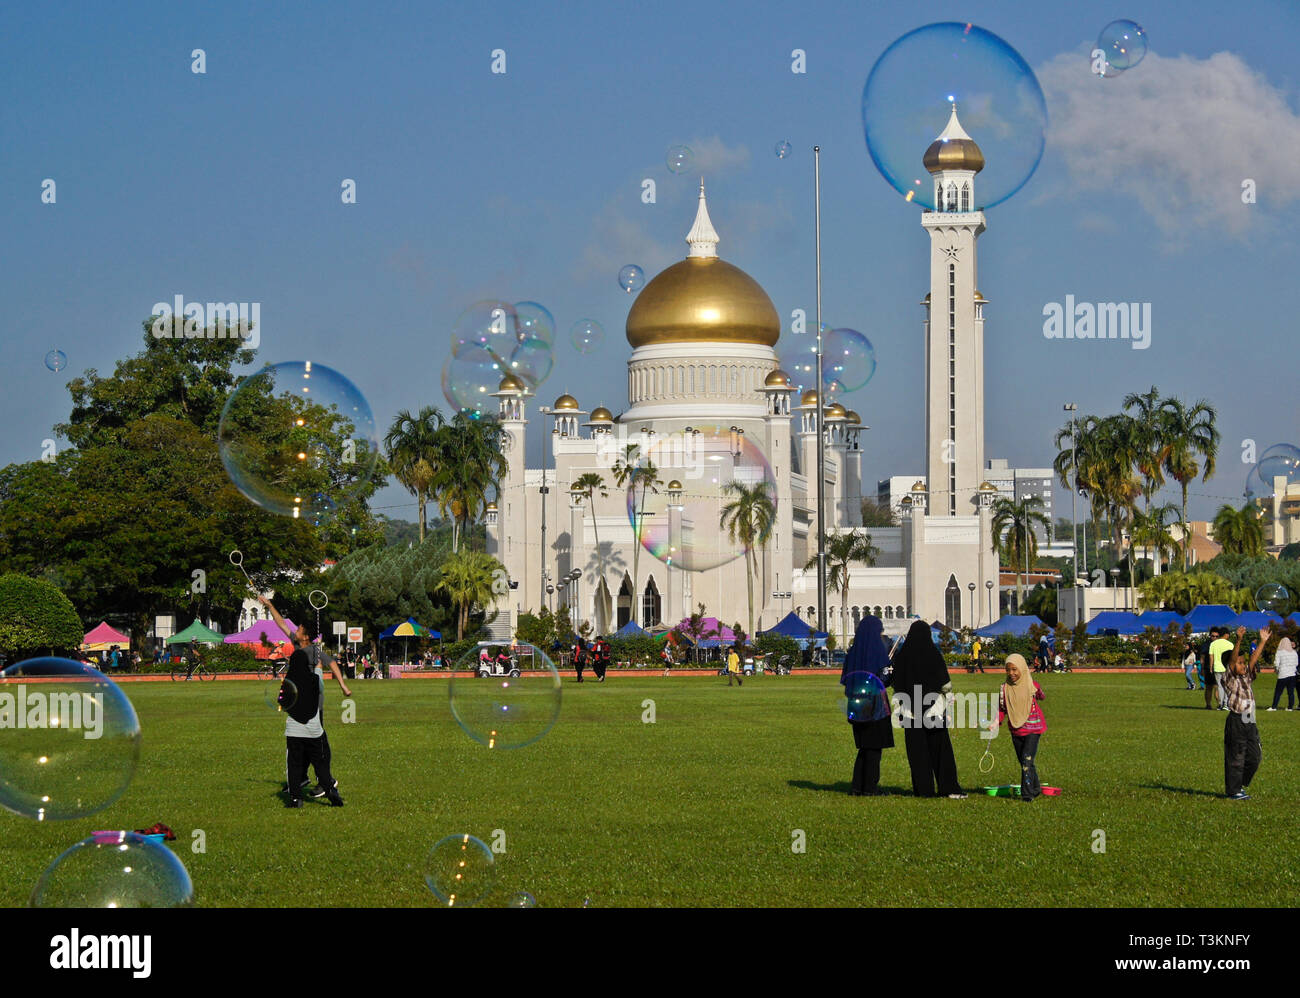 Children make bubbles in the park next to Sultan Oman Ali Saifuddien Mosque, Bandar Seri Begawan, Sultanate of Brunei - Stock Image